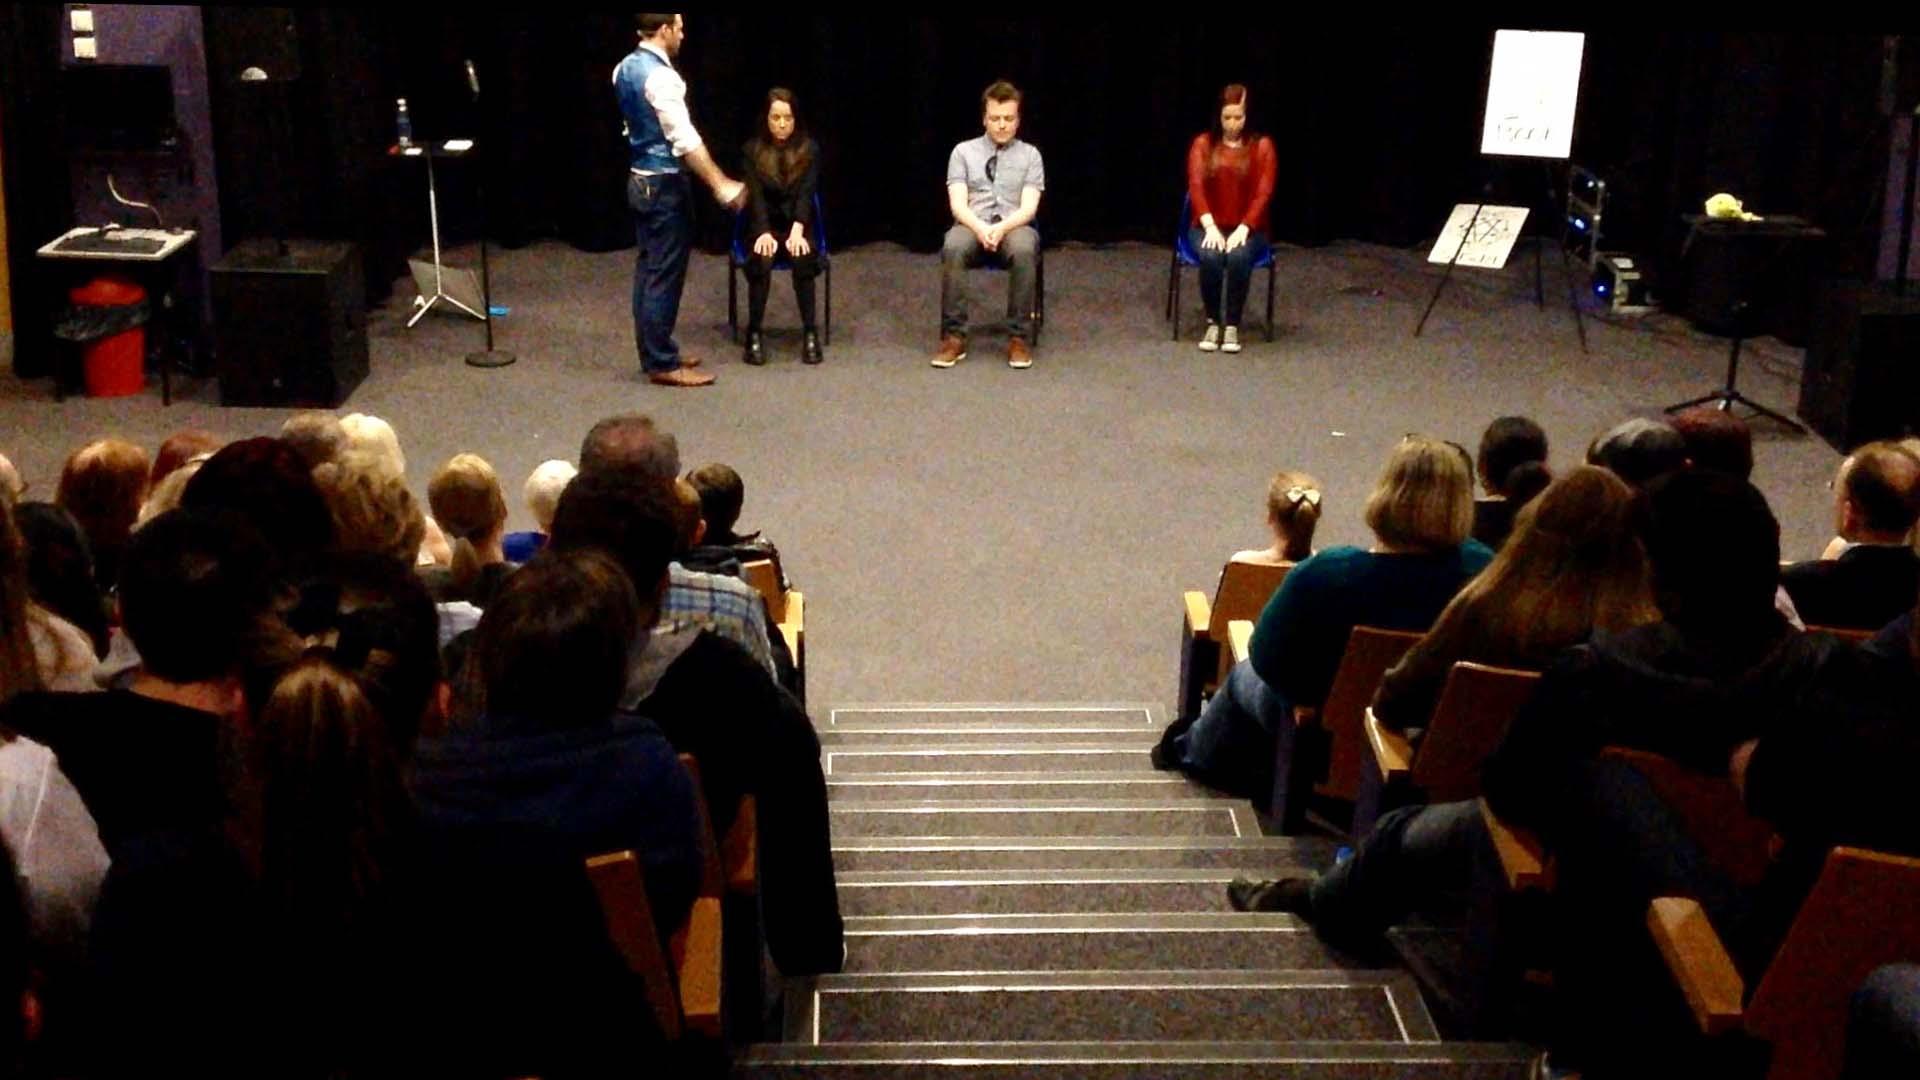 edinburgh fringe audience view of mind games